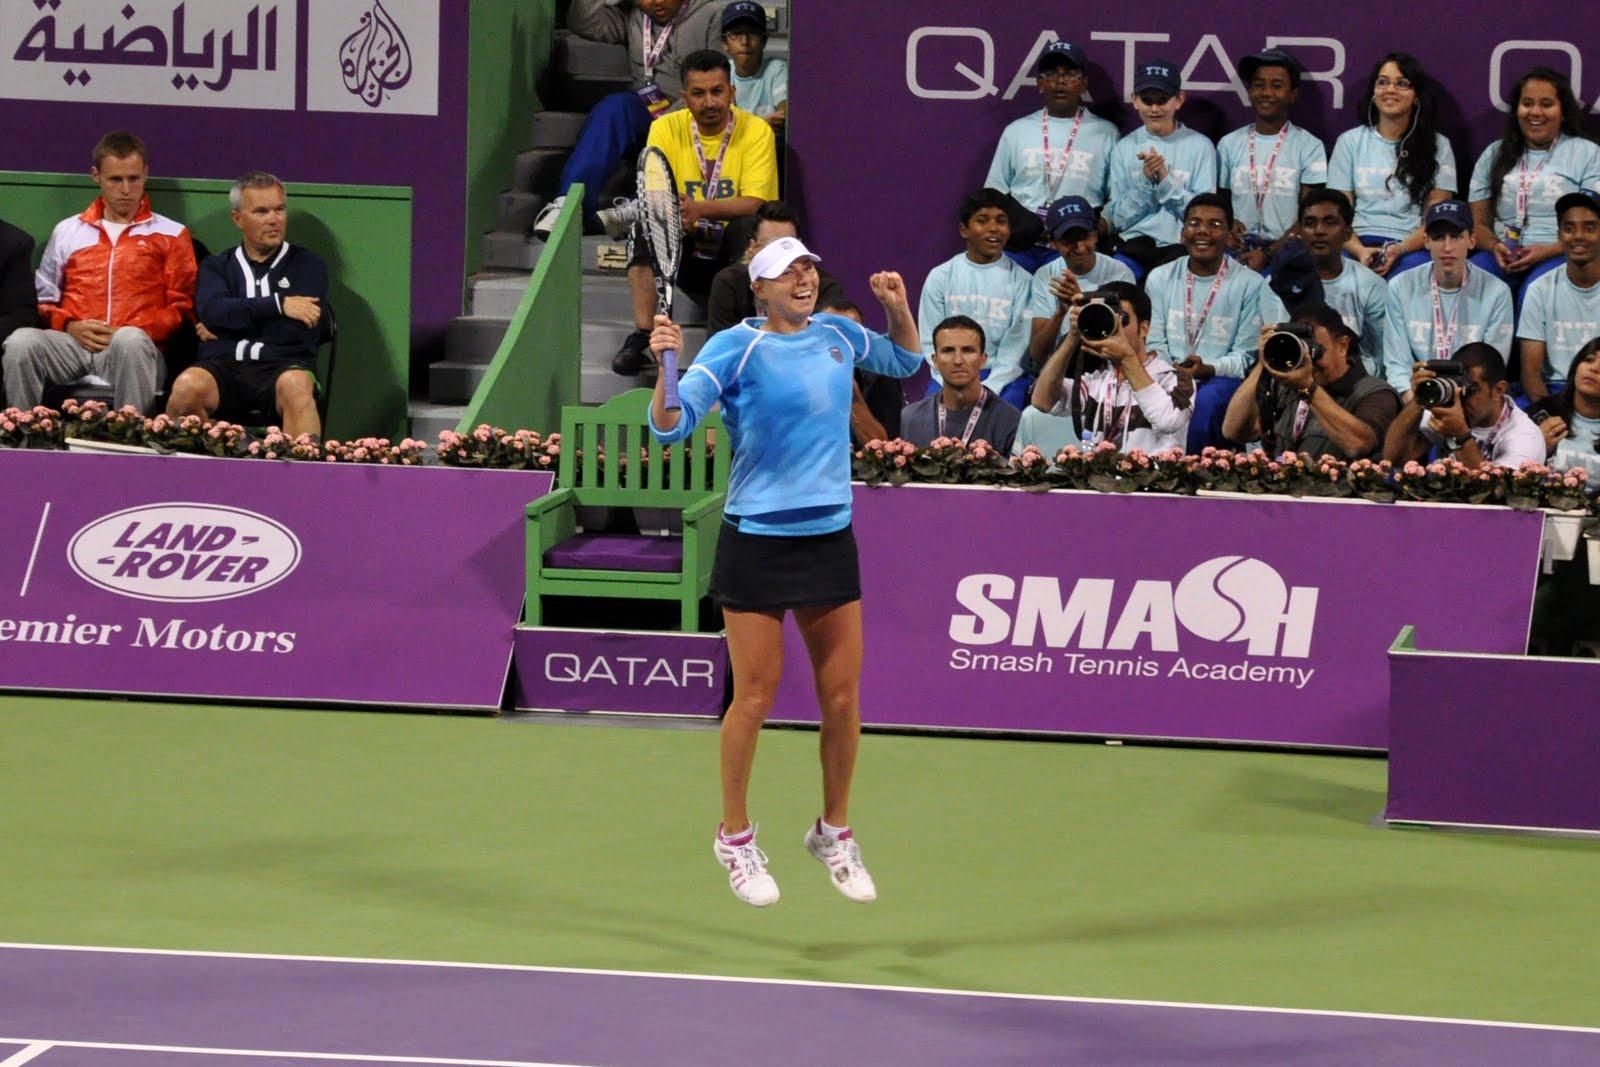 http://3.bp.blogspot.com/-pCvl_PaFqI4/TWoGGv0s5TI/AAAAAAAAIY4/L1CpWdtBrM4/s1600/tennis%2Bzvonareva%2Bdoha%2BDSC_8768.jpg